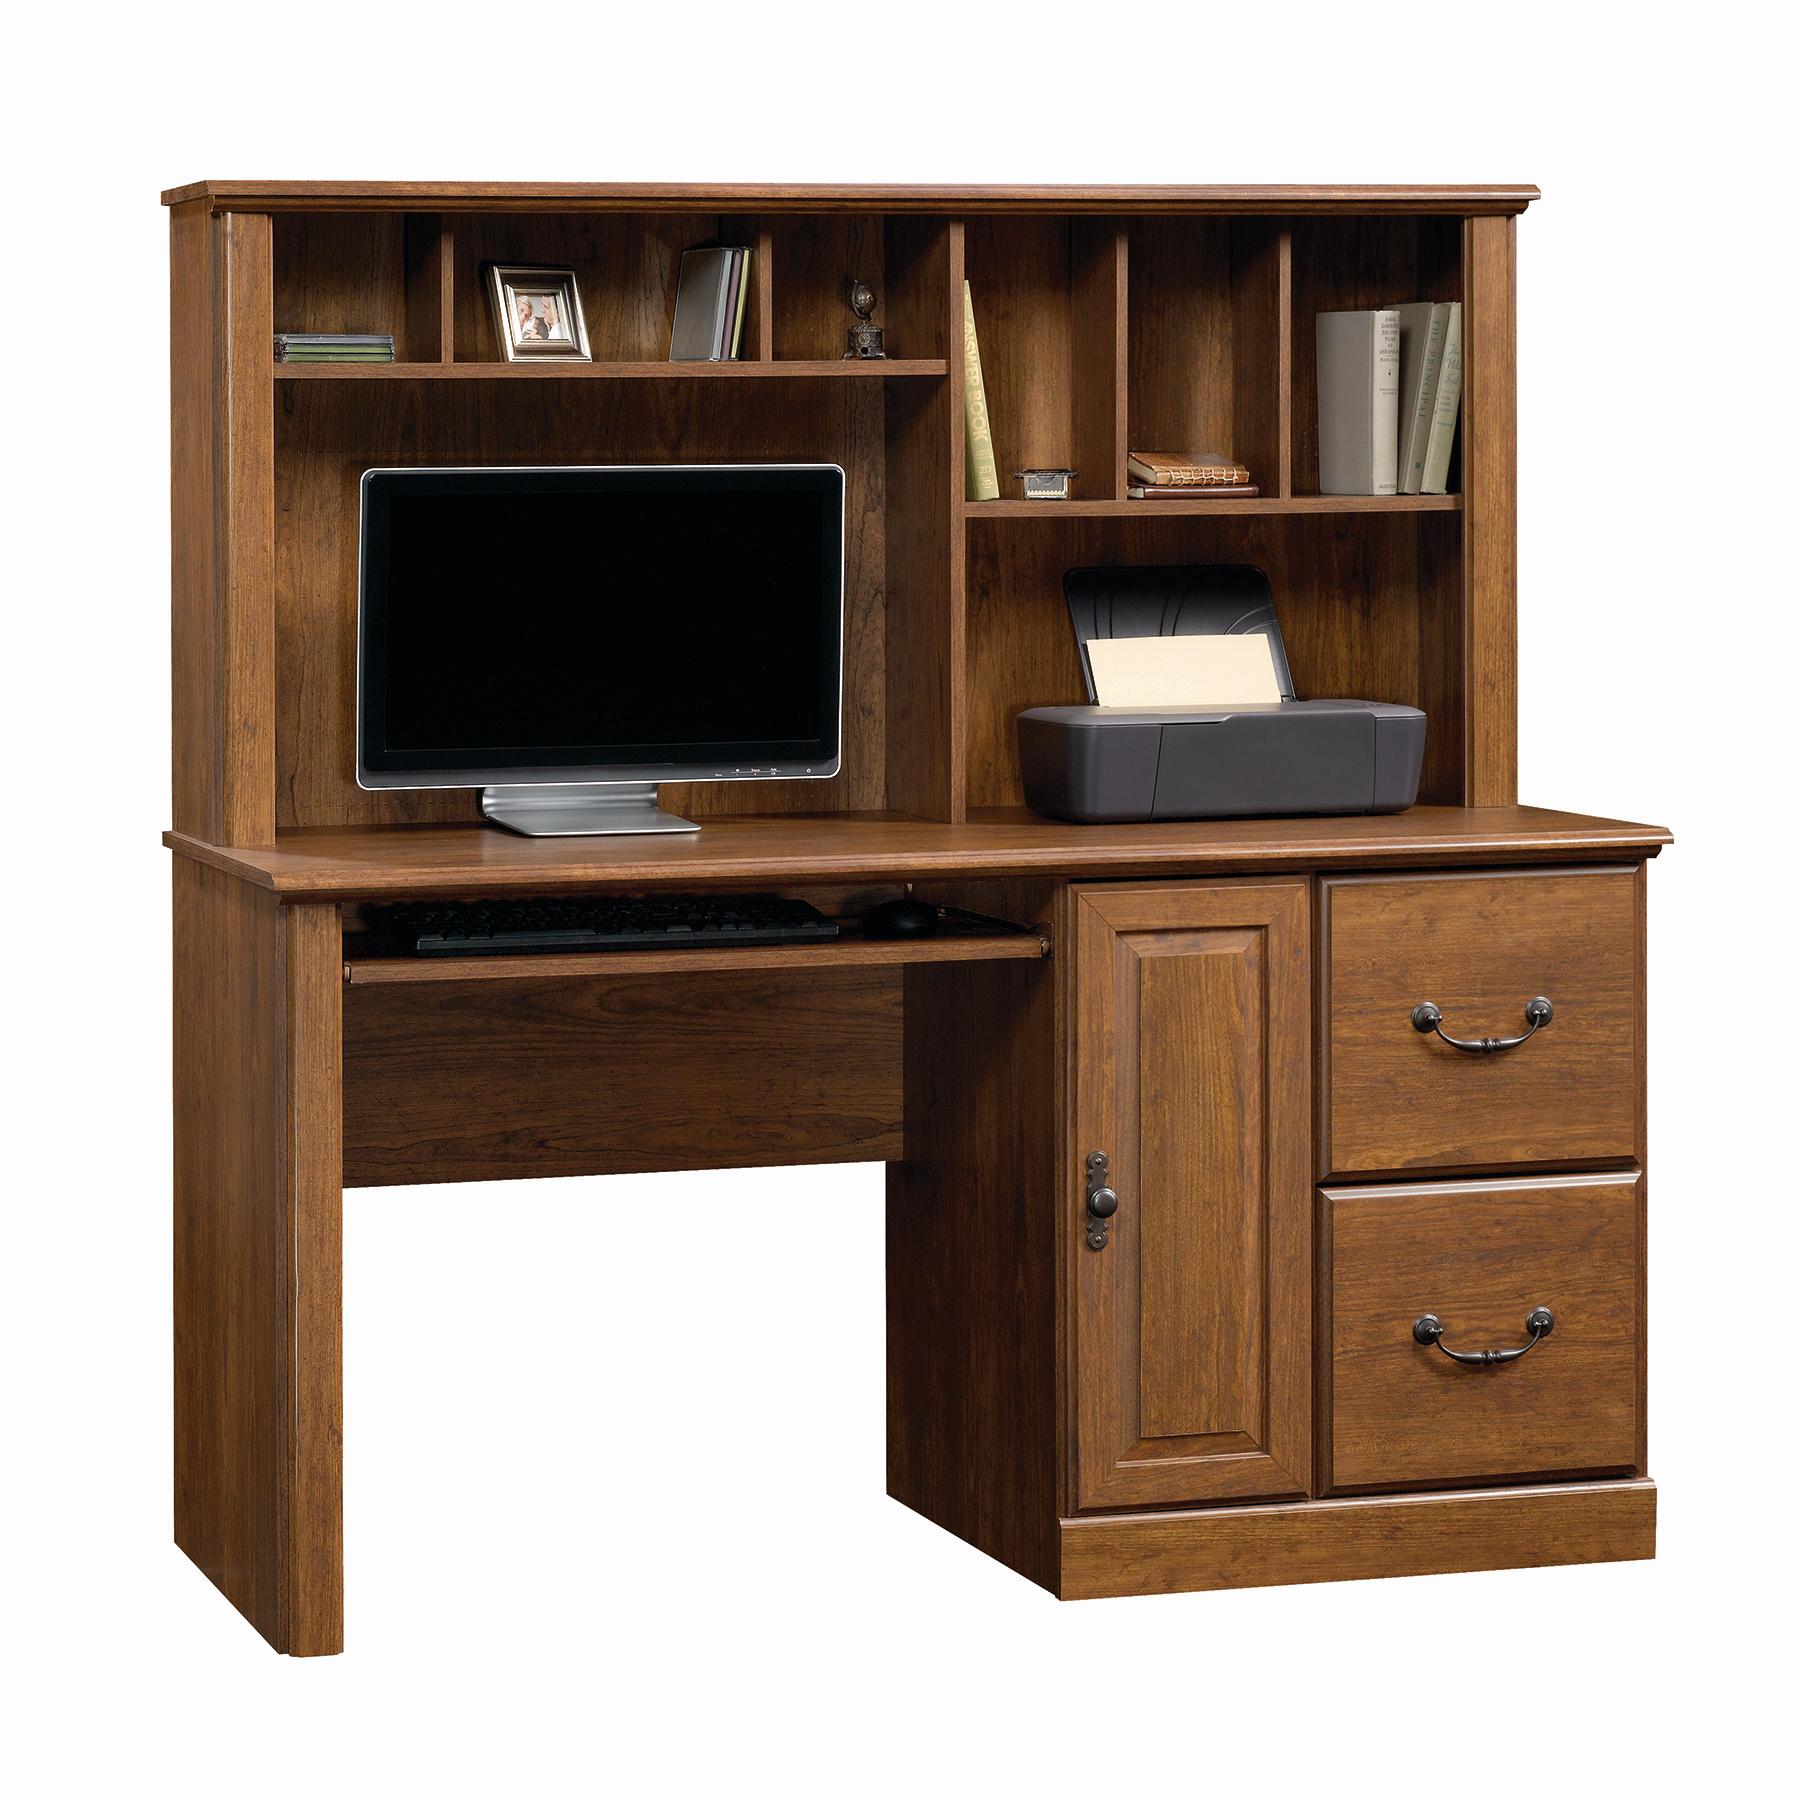 Sauder Orchard Hills Computer Desk wHutch